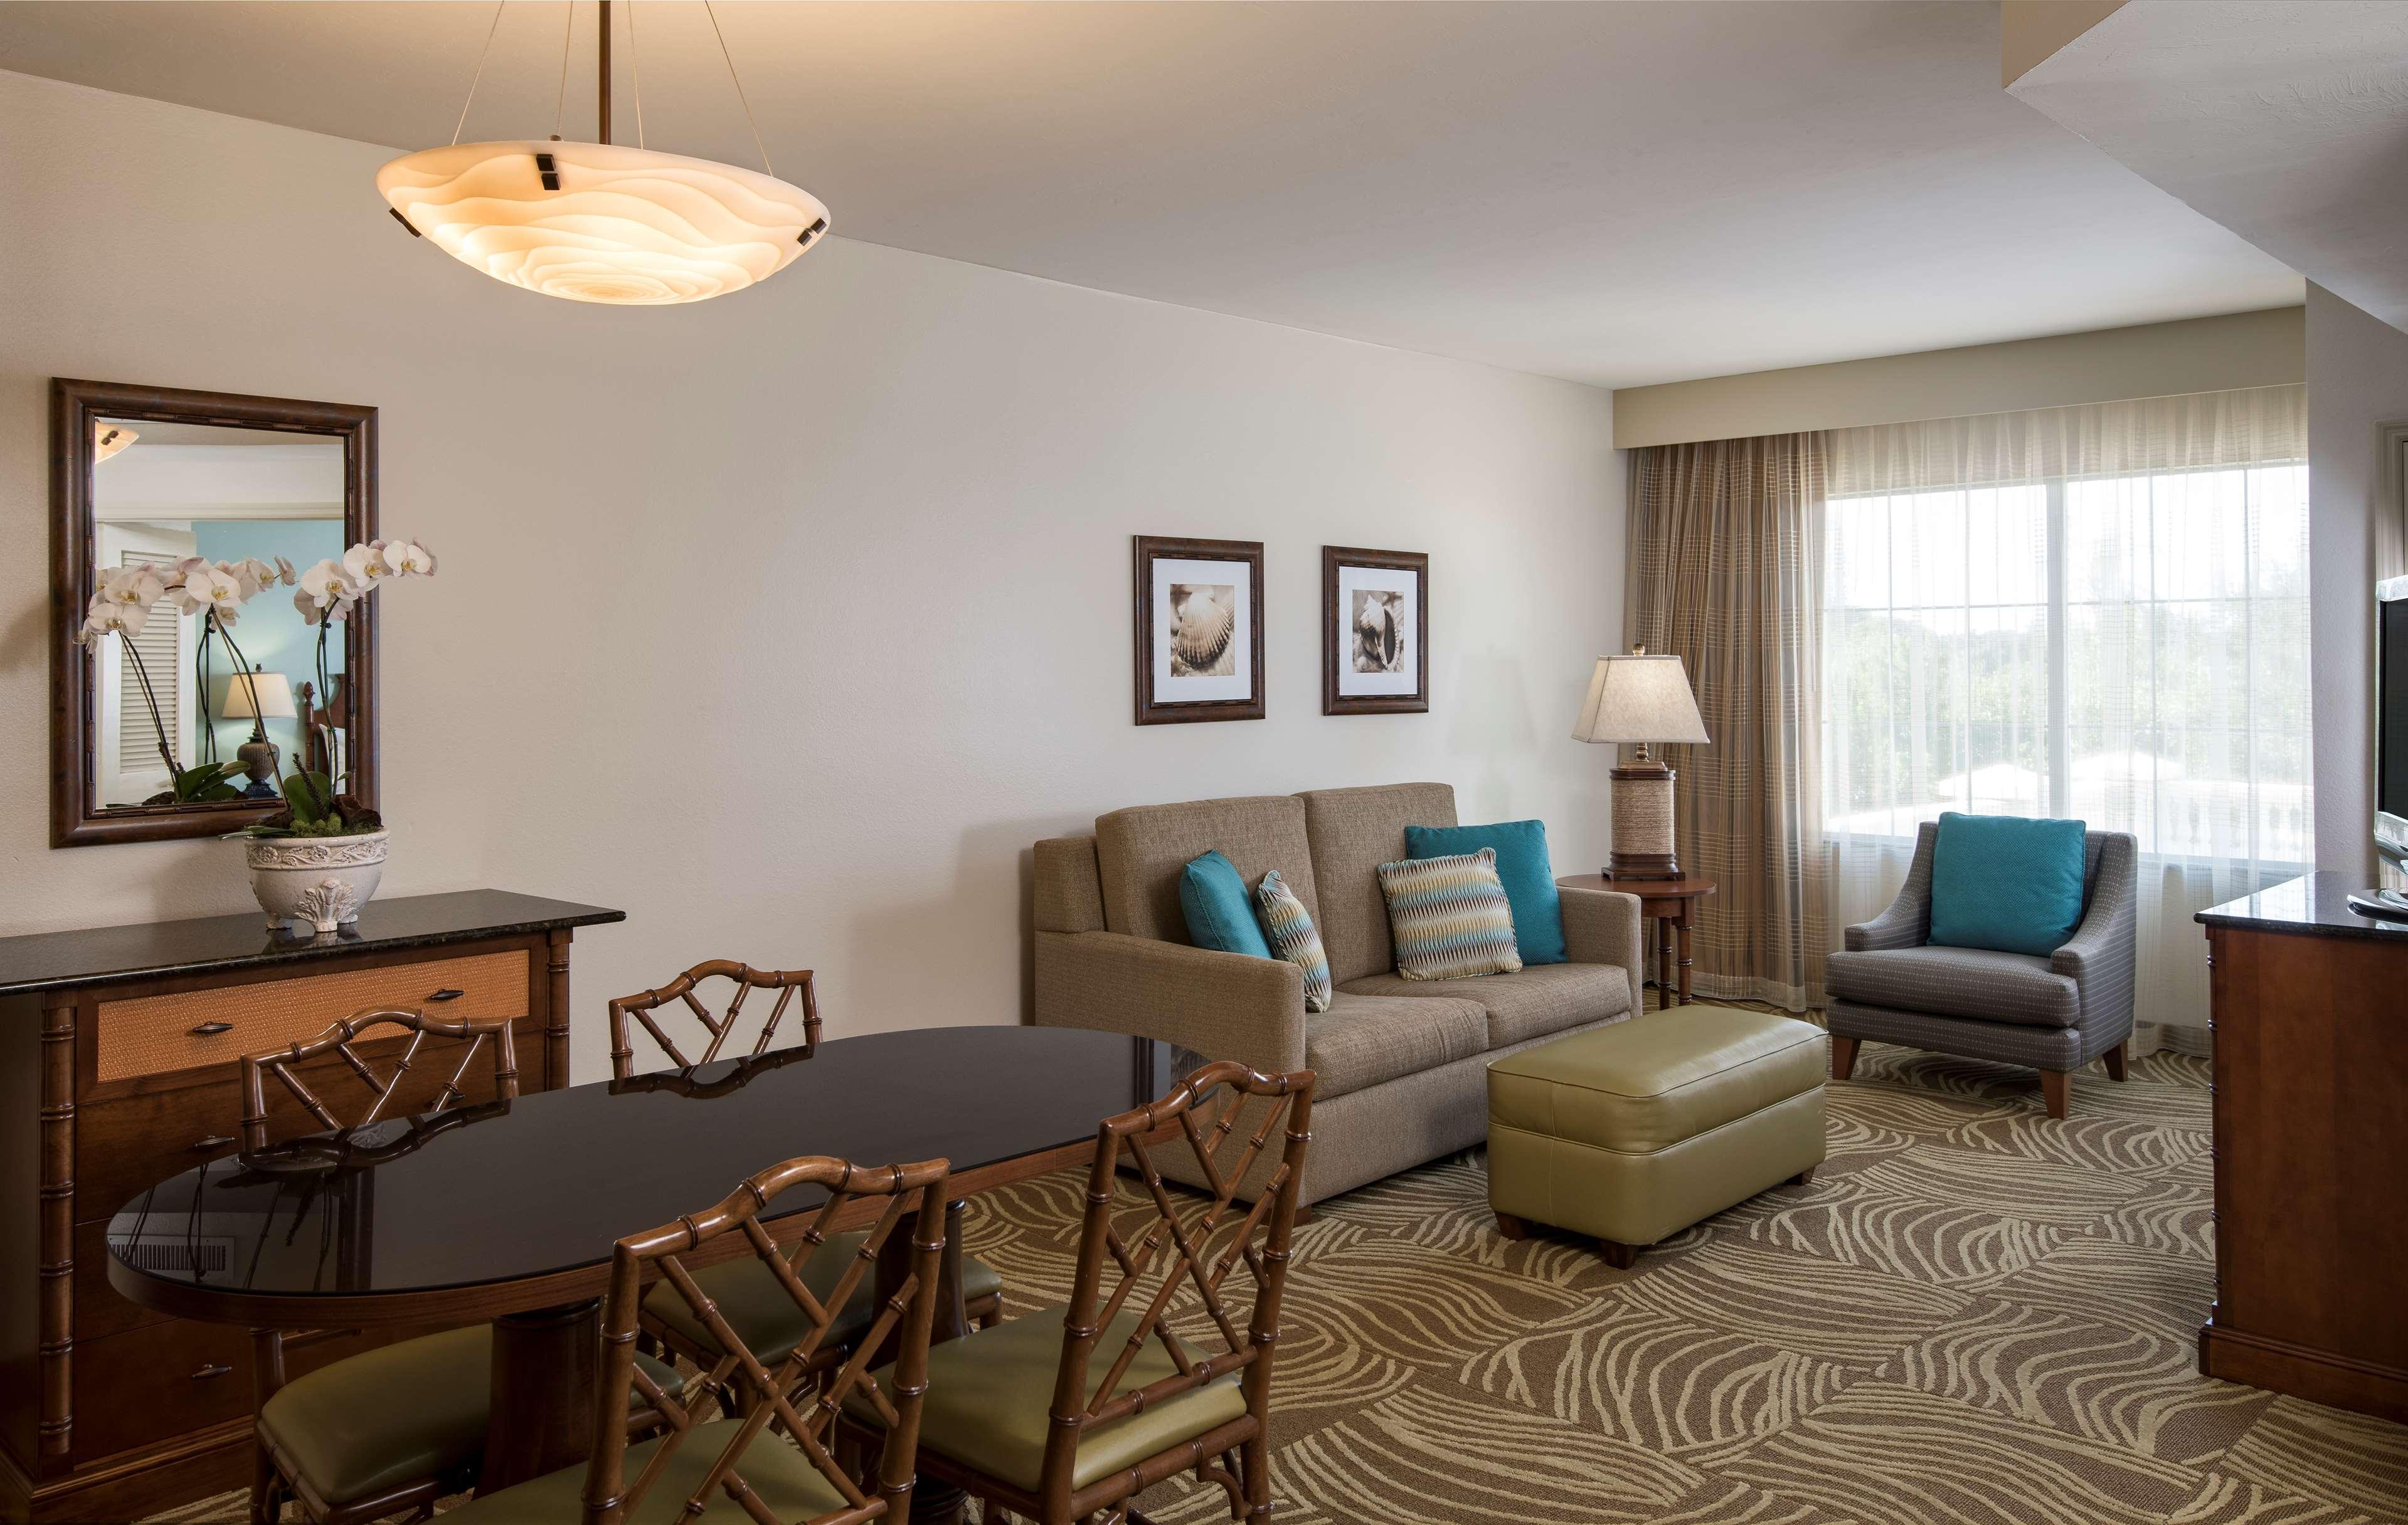 DoubleTree Suites by Hilton Hotel Naples image 26